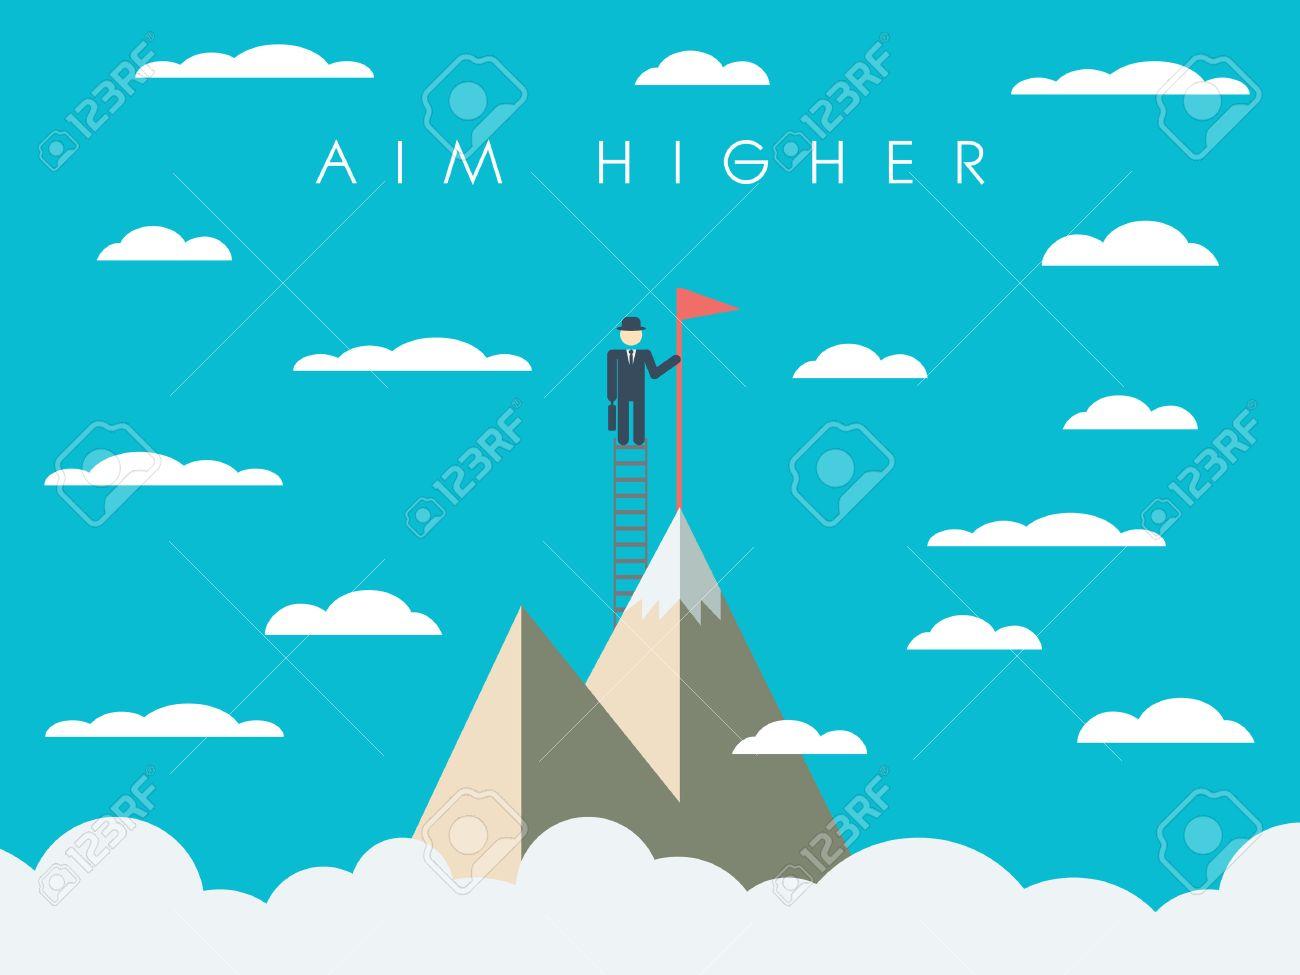 Career Or Business Mission Motivation Poster Wallpaper Background Businessman On Ladder Mountain